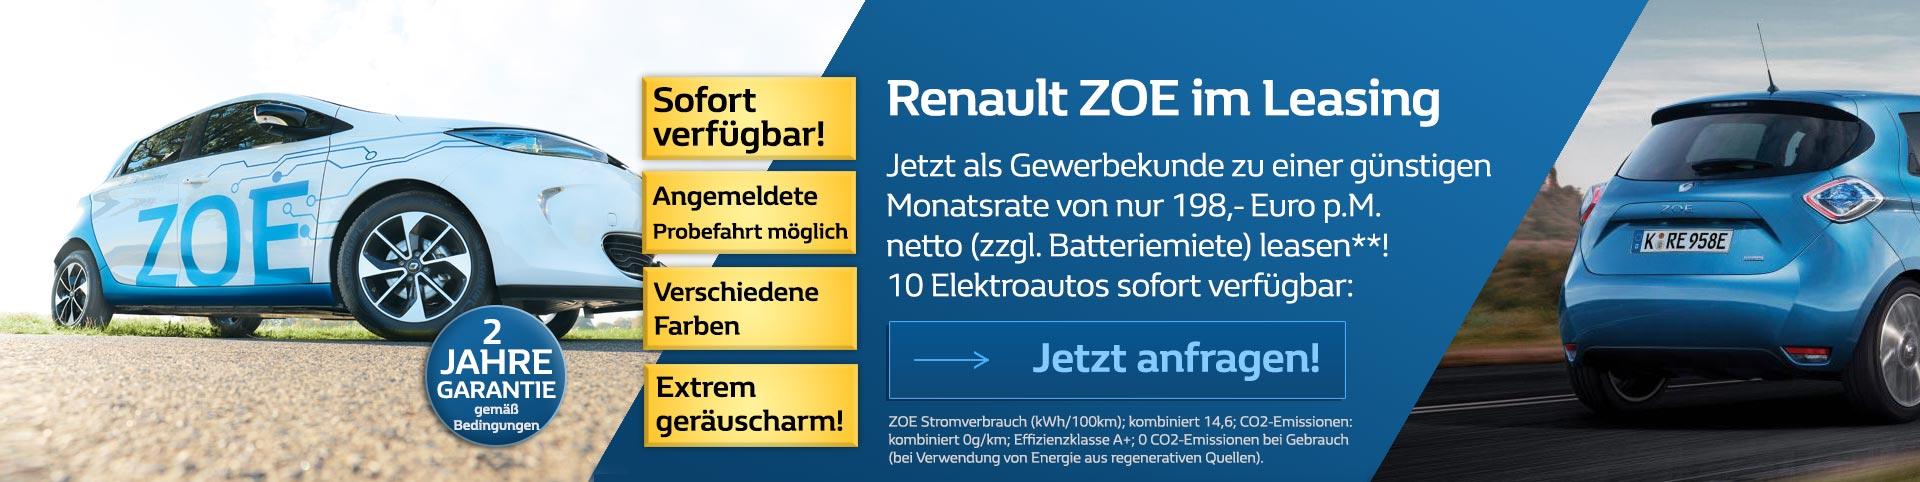 Renault Zoe Leasing 198 Euro